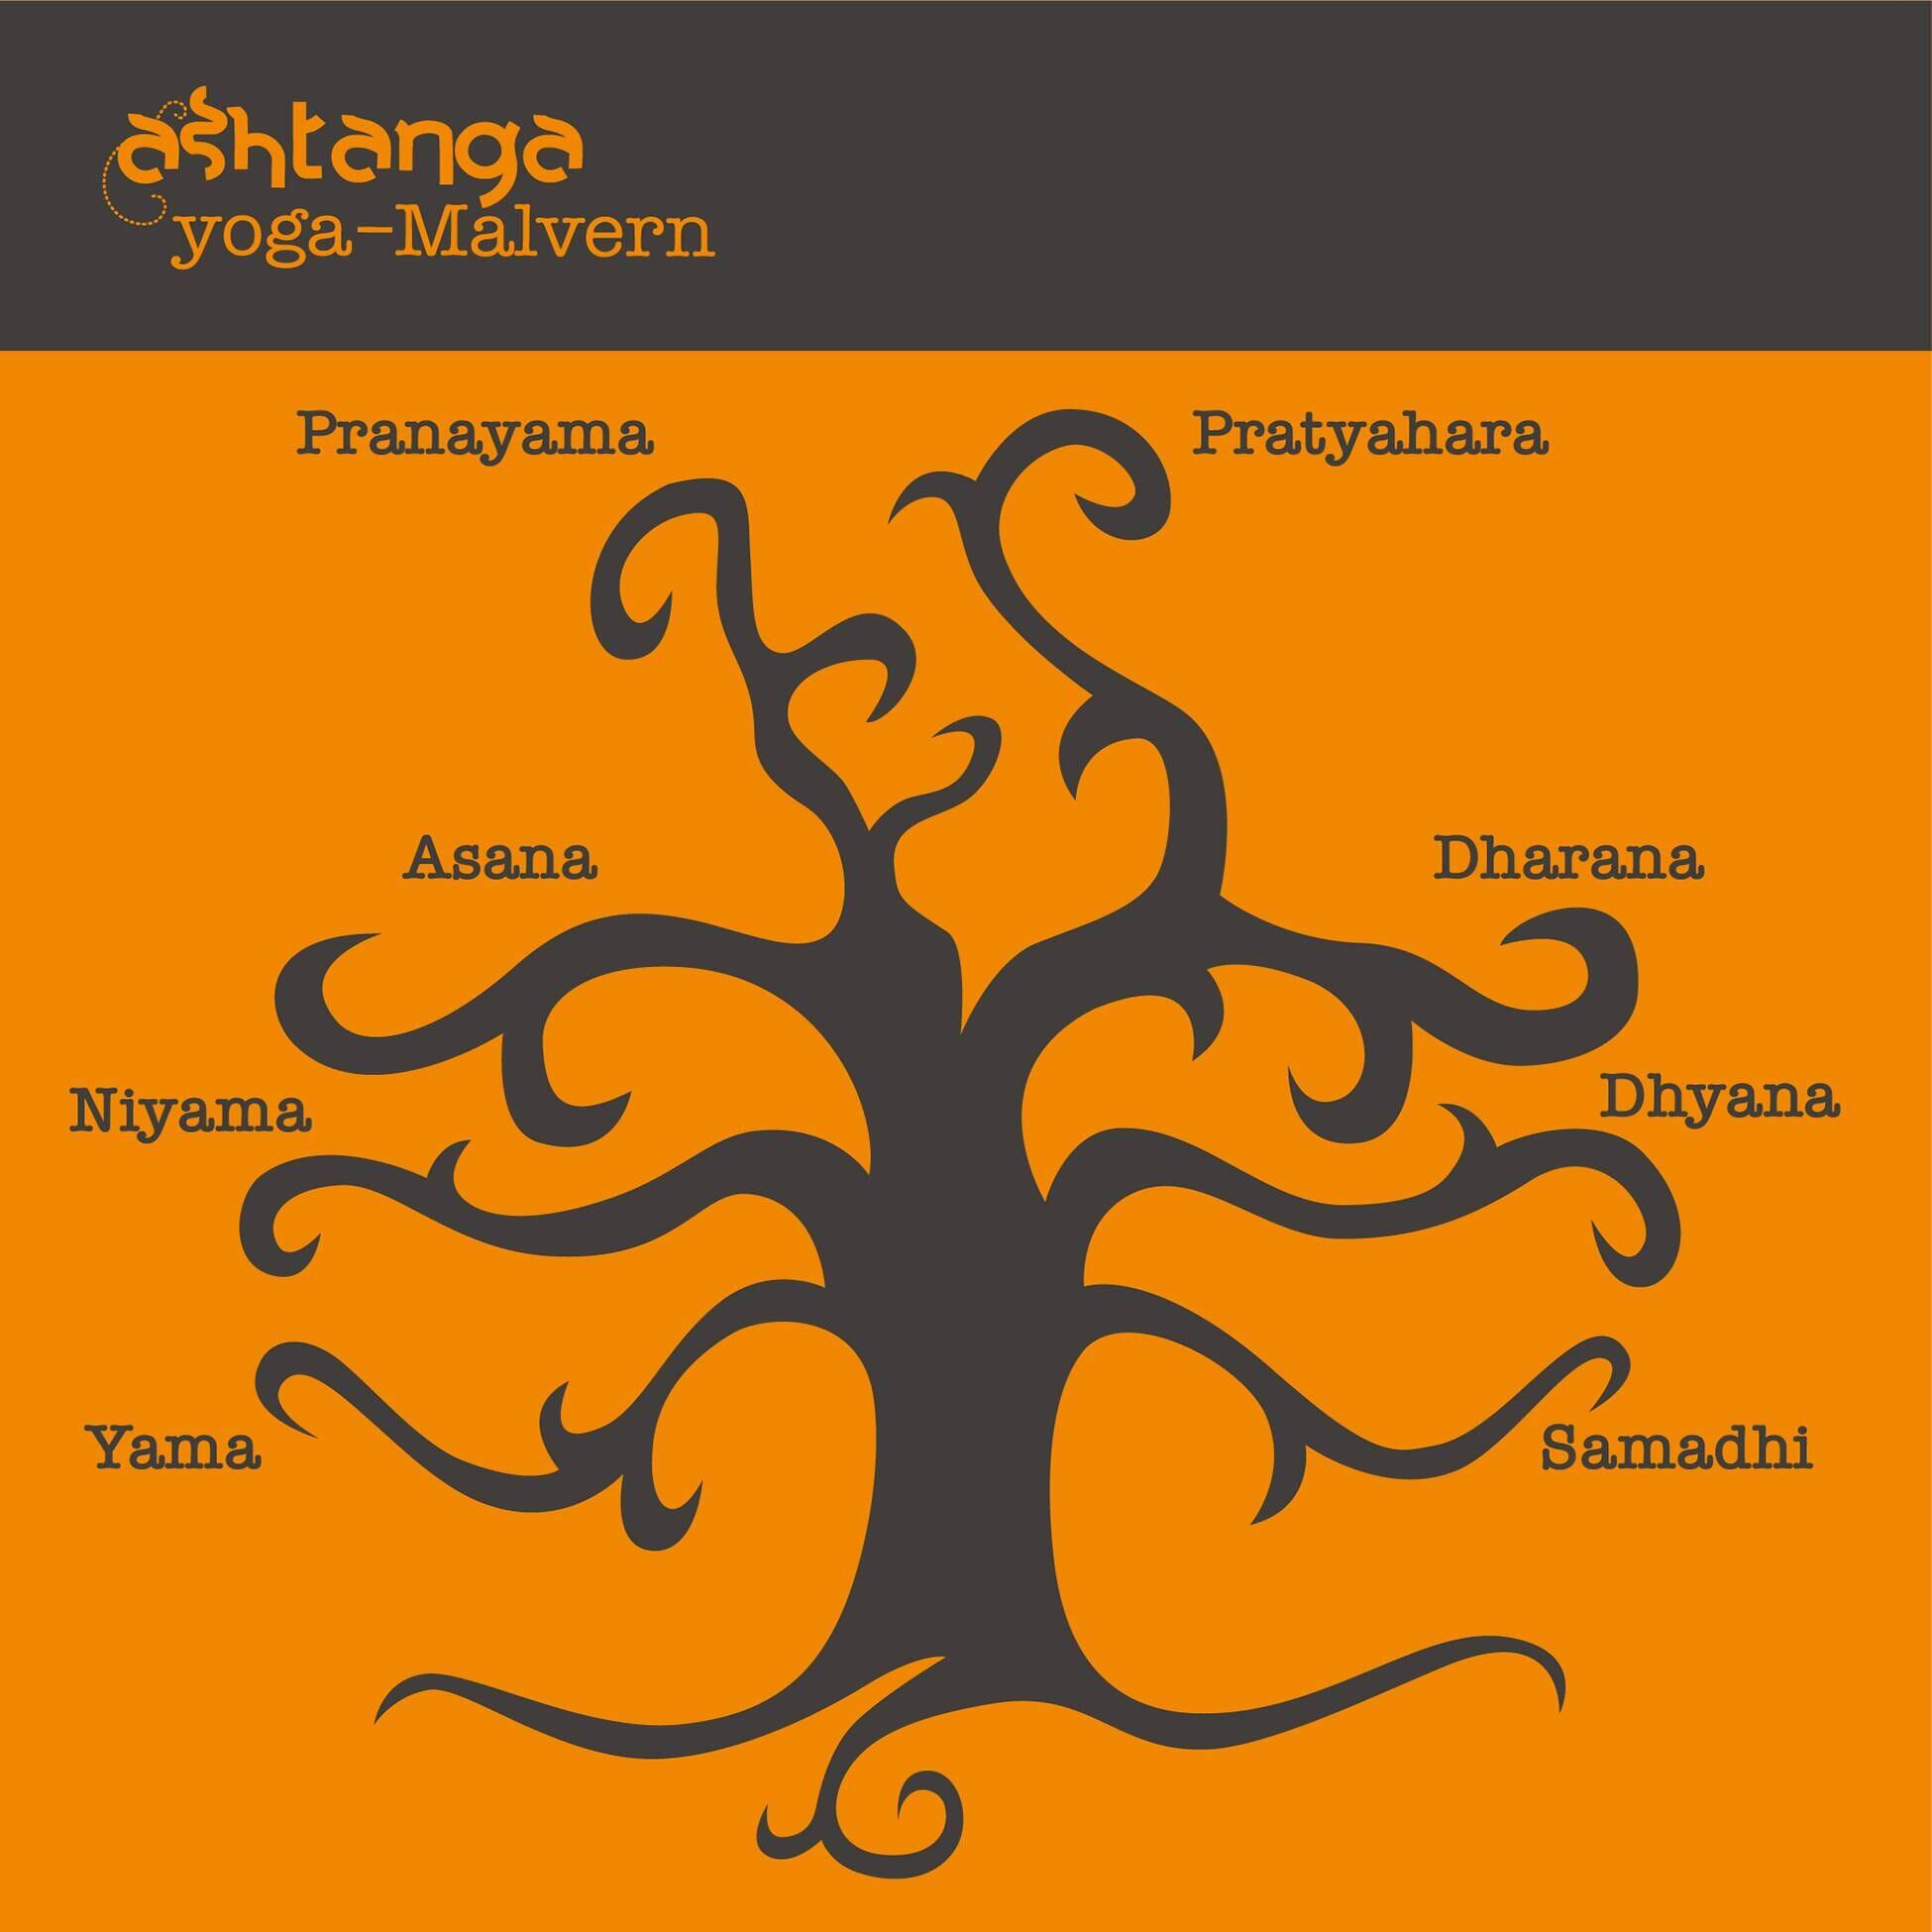 Ashtanga yoga Malvern 8 Limbs Samadhi